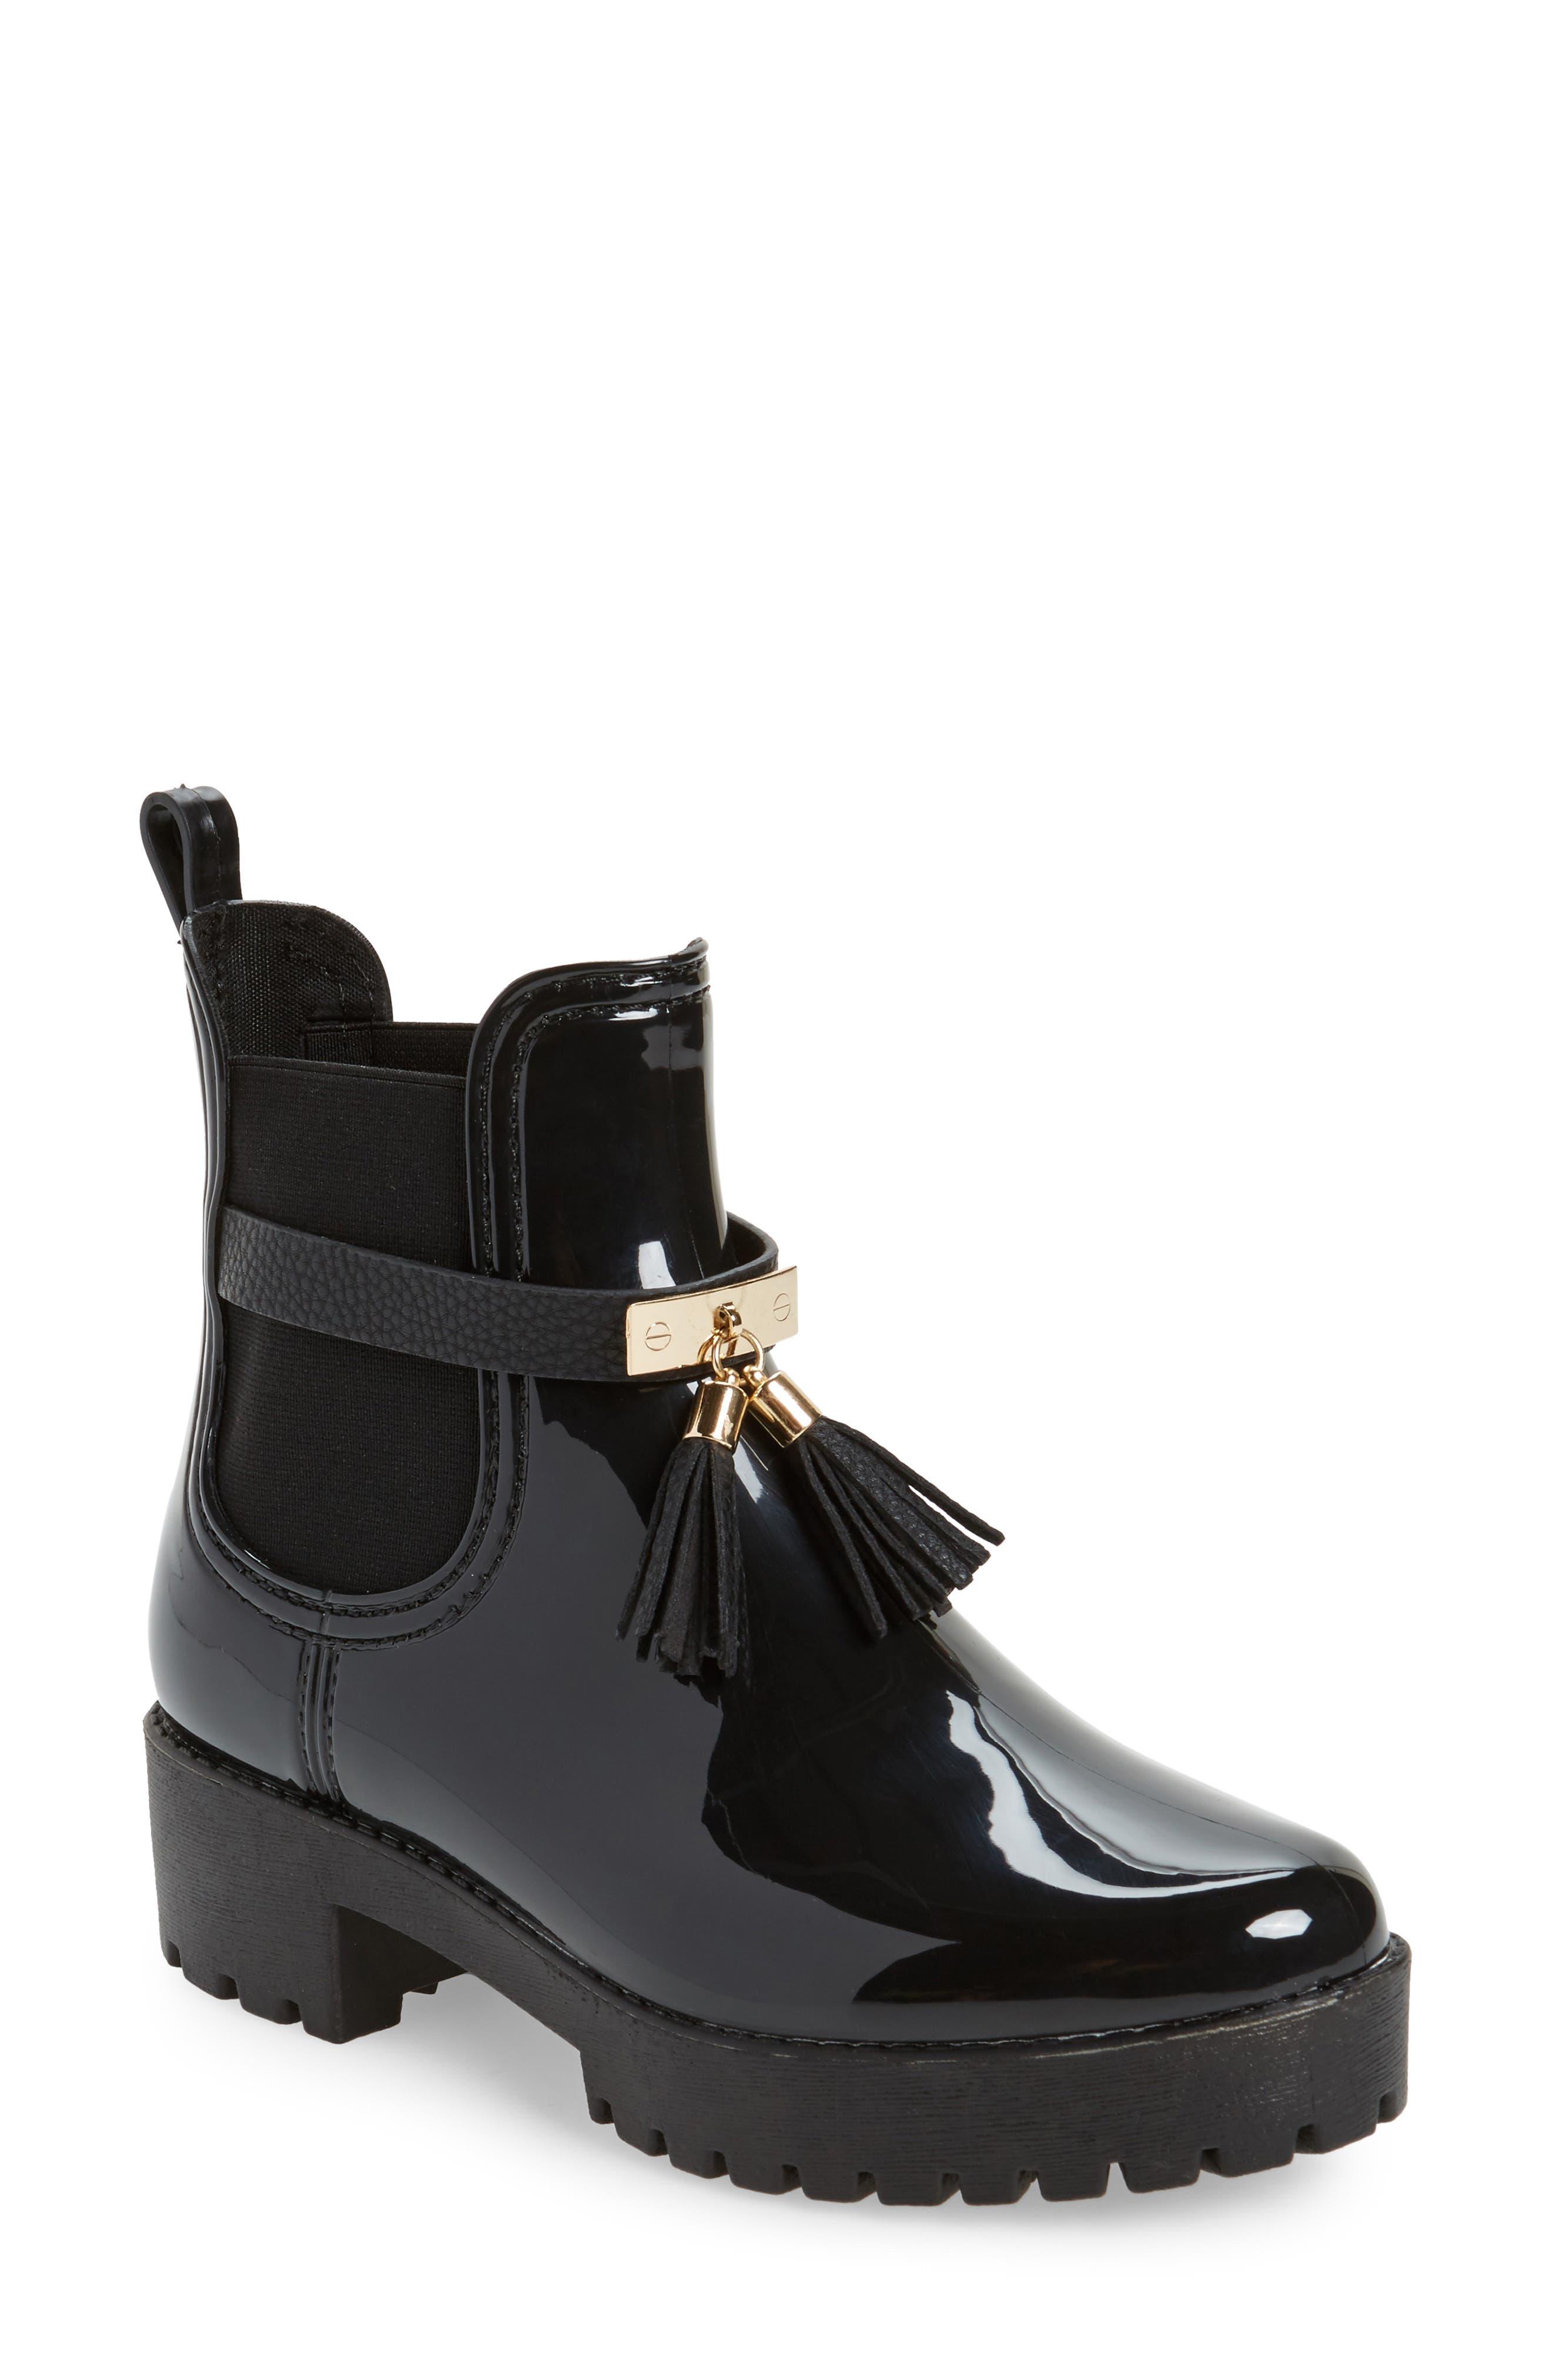 Leeds Tassel Waterproof Chelsea Boot,                             Main thumbnail 1, color,                             001